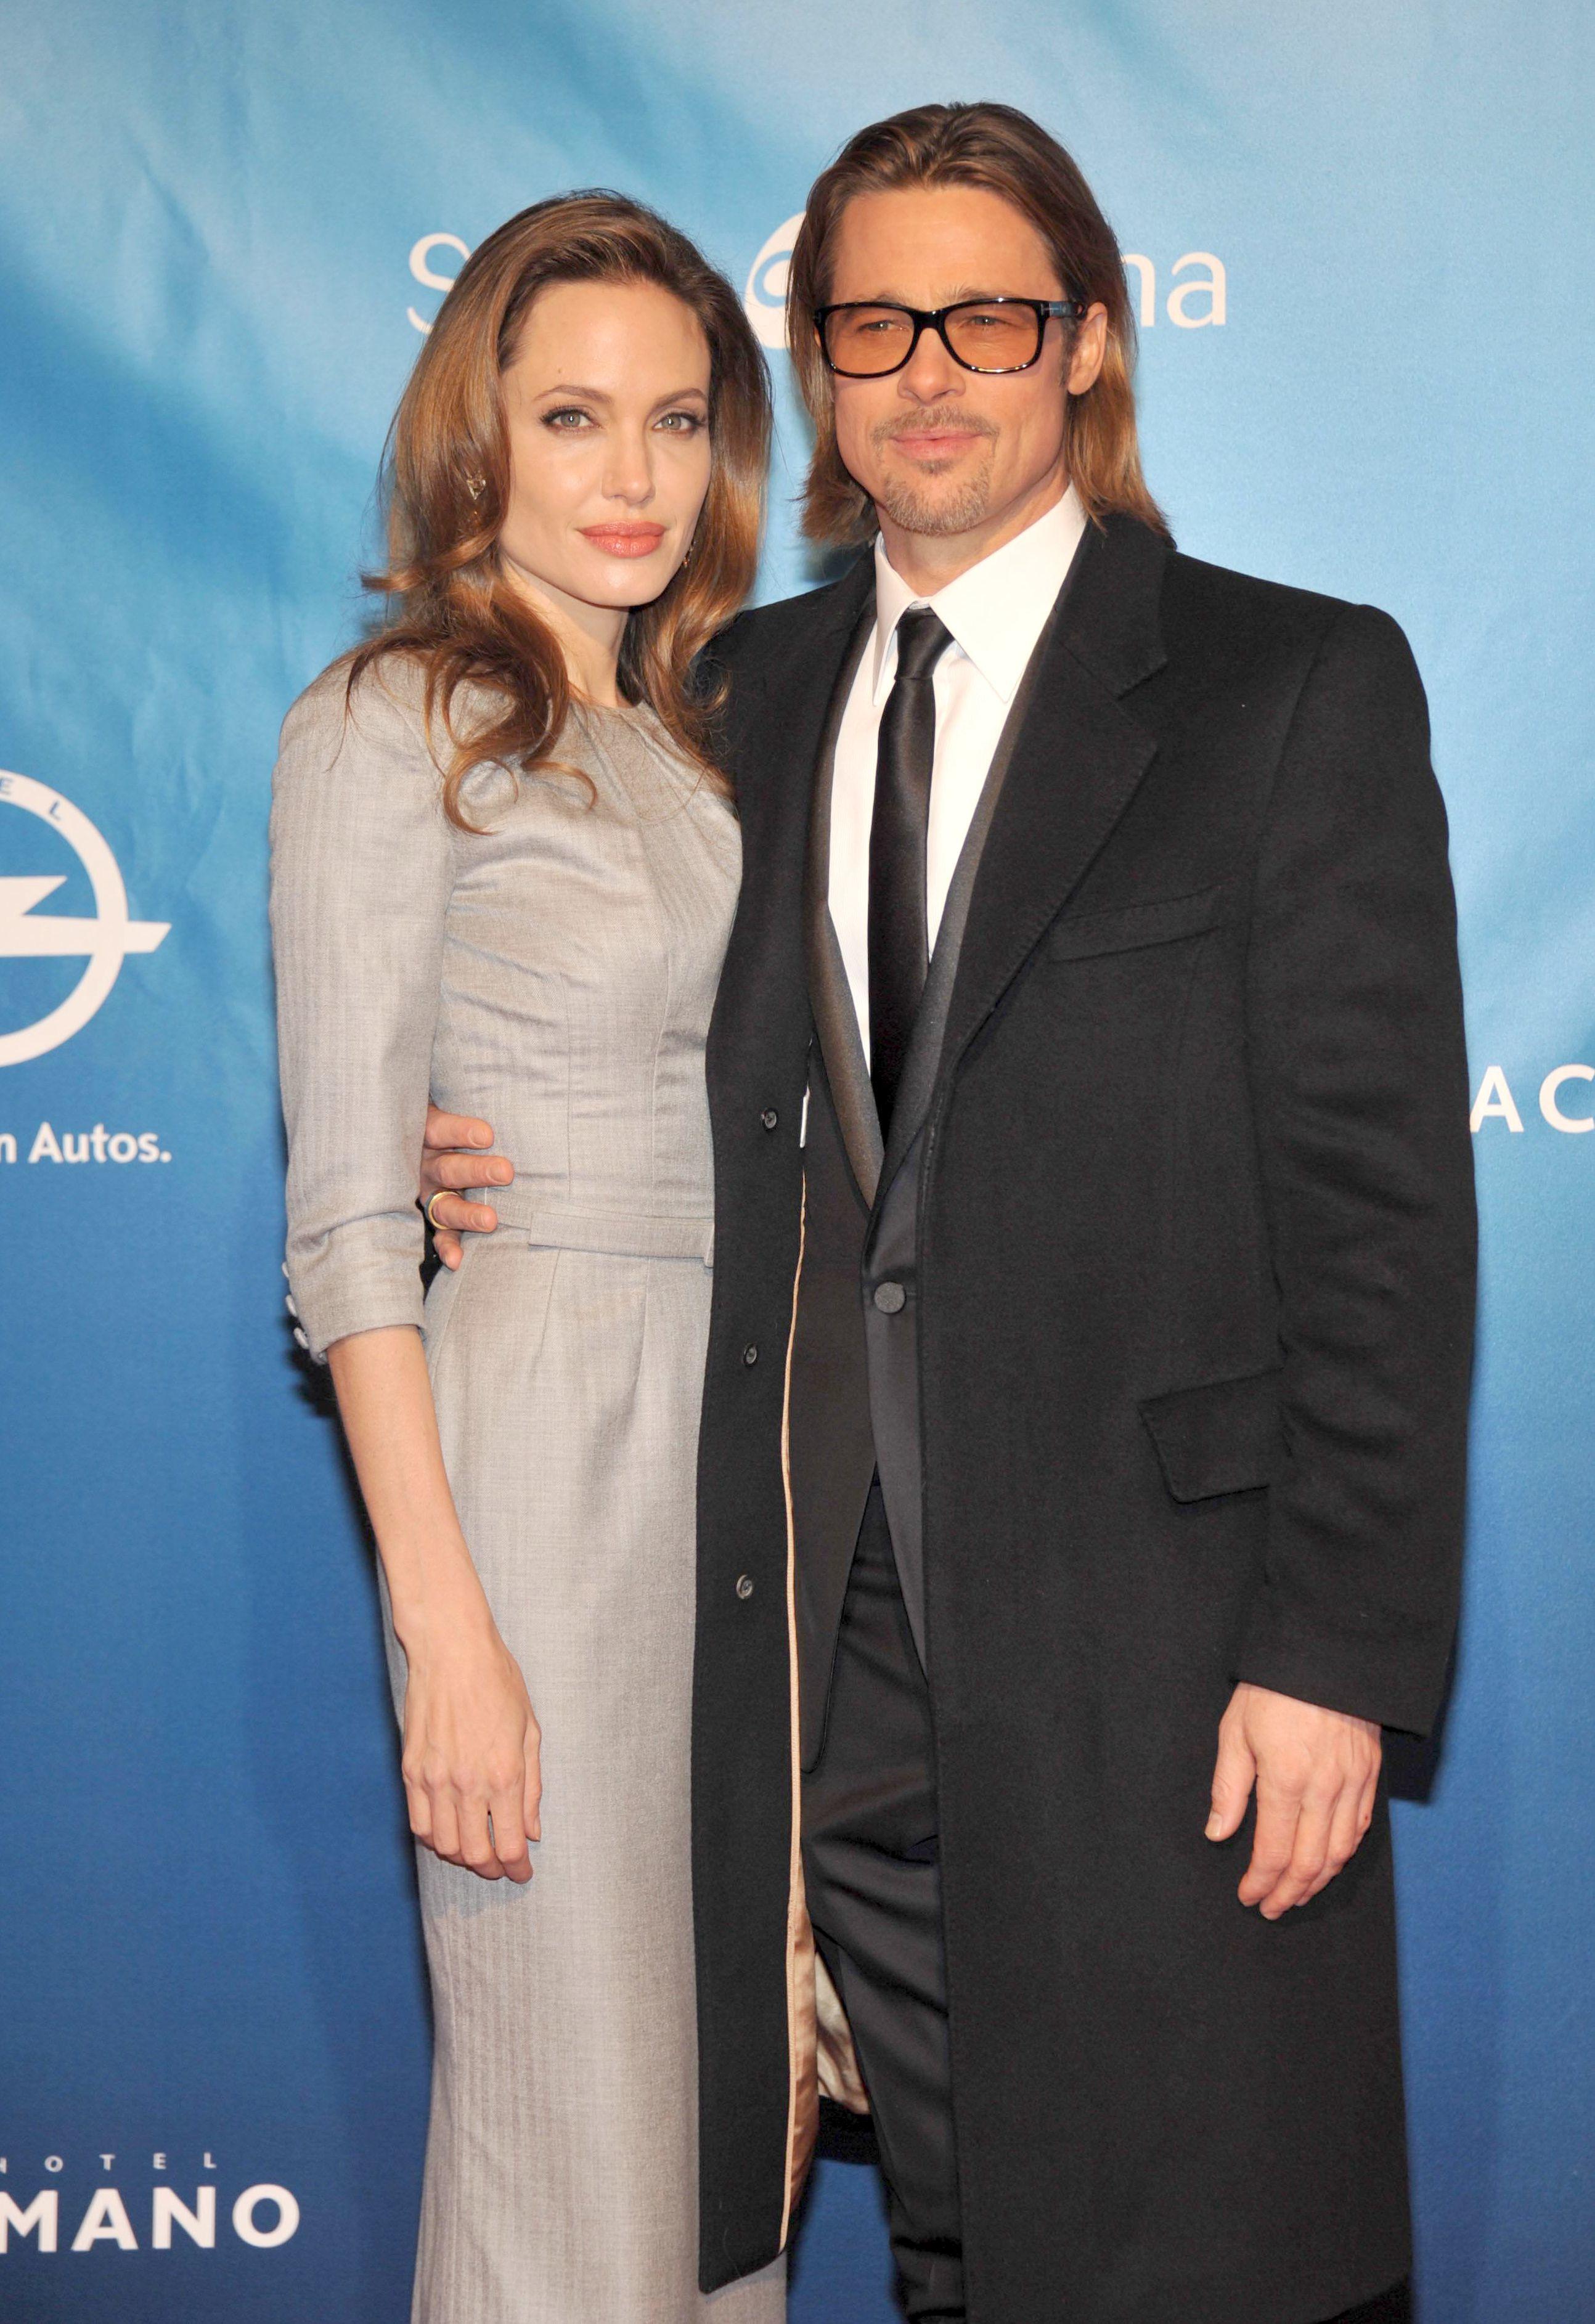 Angelina Jolie silver dress Brad Pitt tuxedo